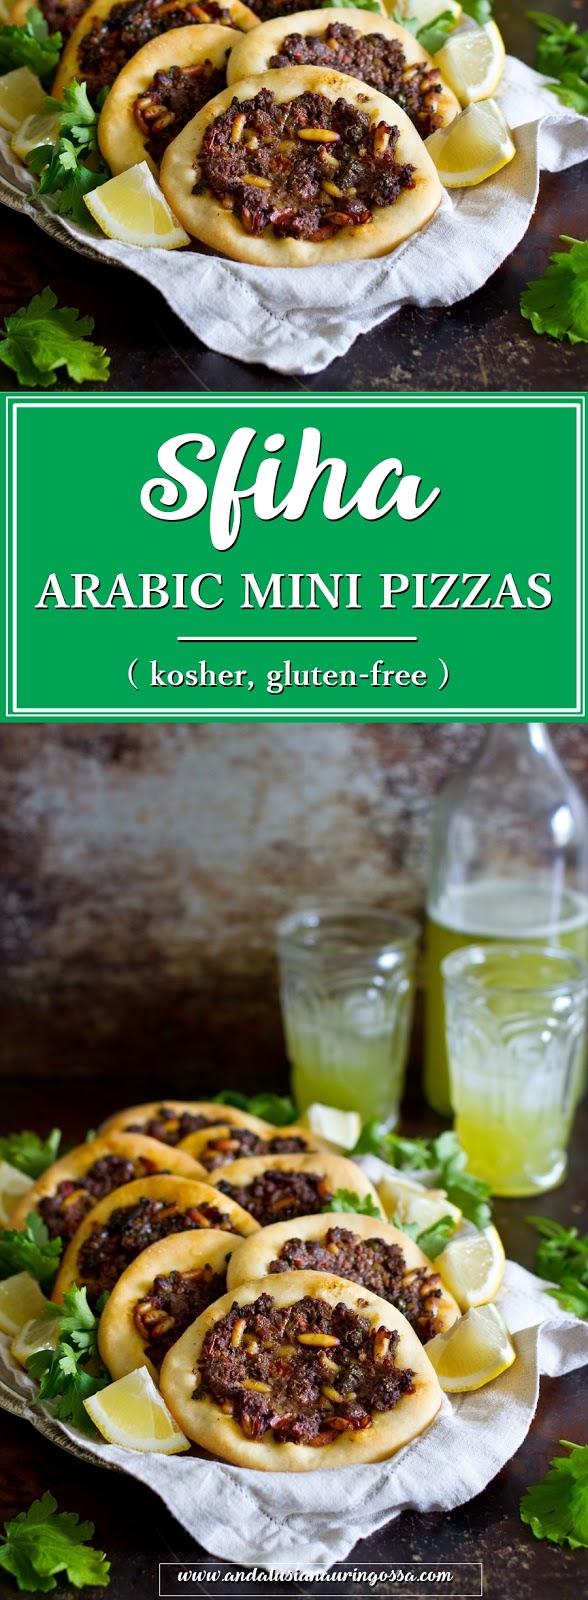 sfiha_arabialainen minipizza_Hebron_kosher_gluteeniton_Andalusian auringossa_ruokablogi_matkablogi_PIN ME